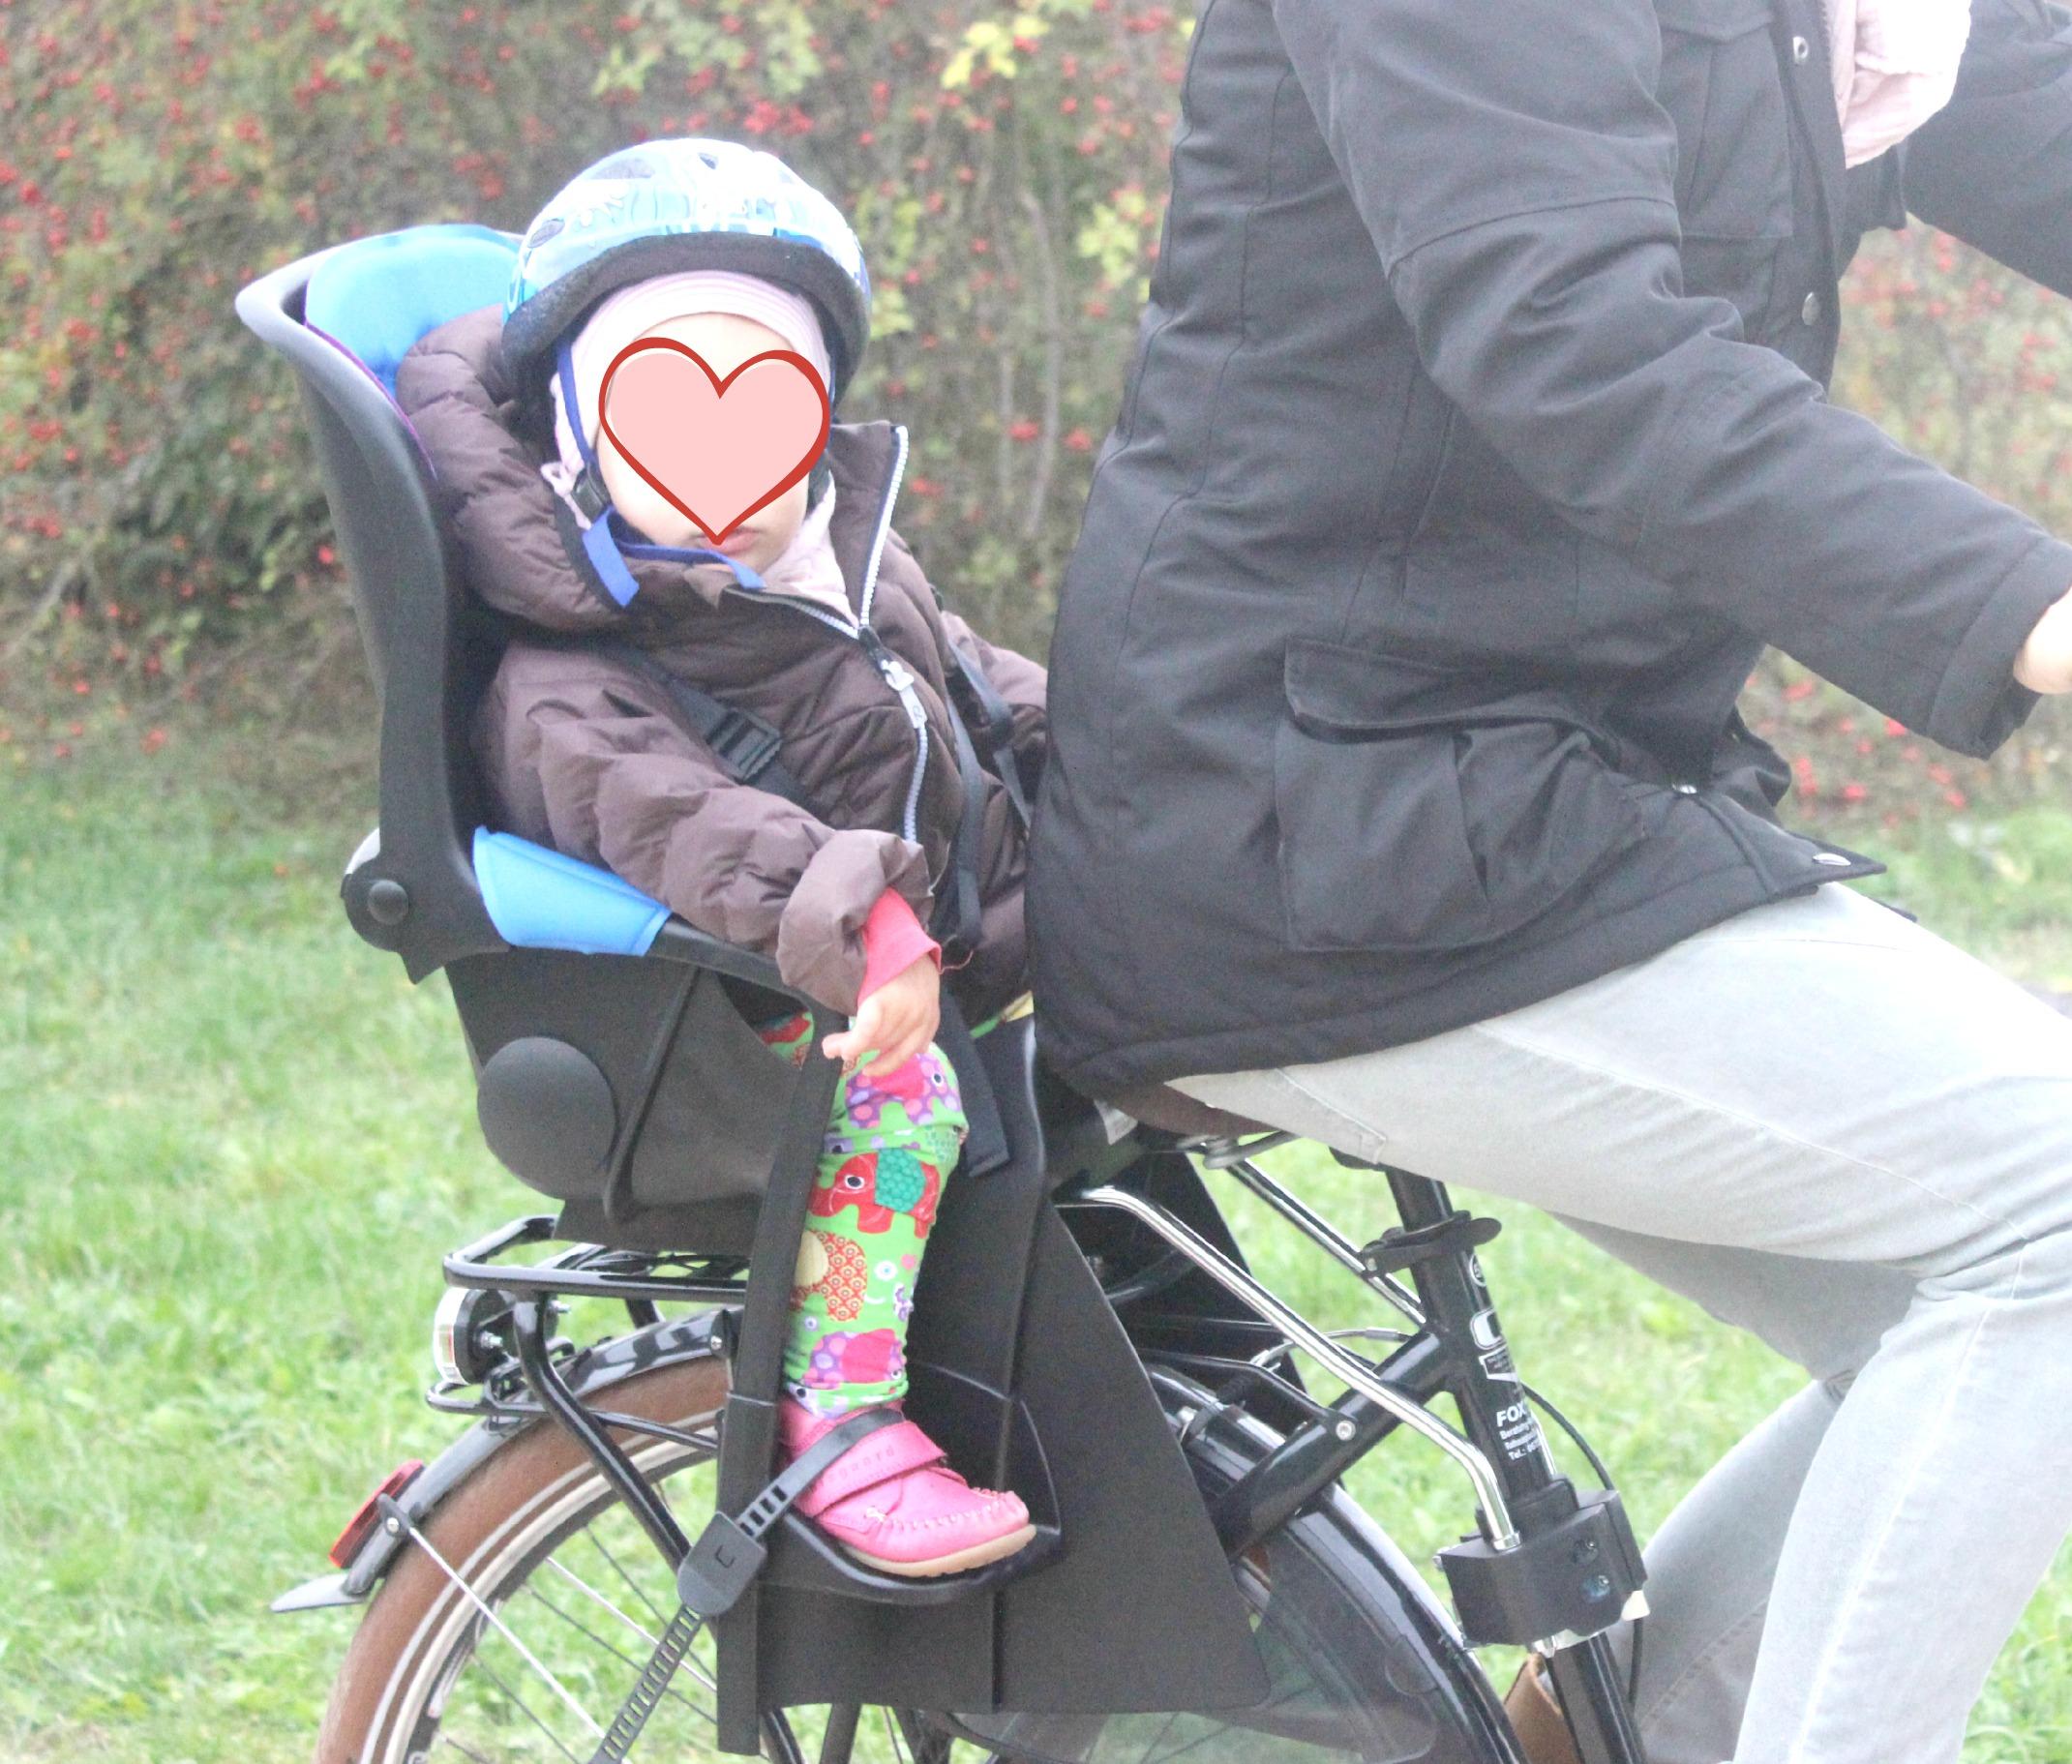 kids fahrradspa mit kleinkind r mer jockey relax. Black Bedroom Furniture Sets. Home Design Ideas